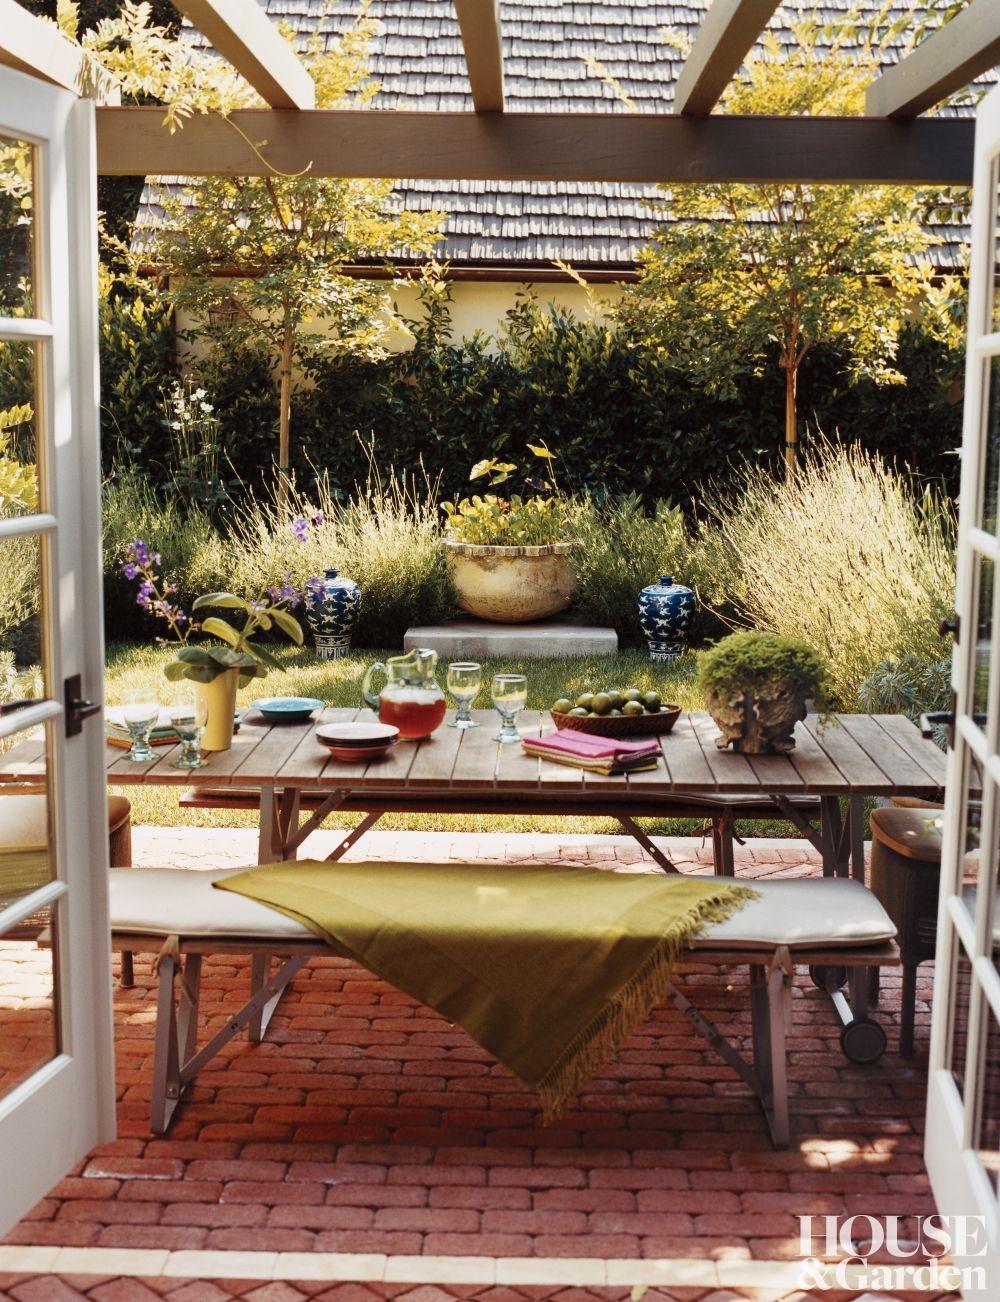 rustic-outdoor-space-kim-alexandriuk-interior-design-los-angeles-california-200708_1000-watermarked